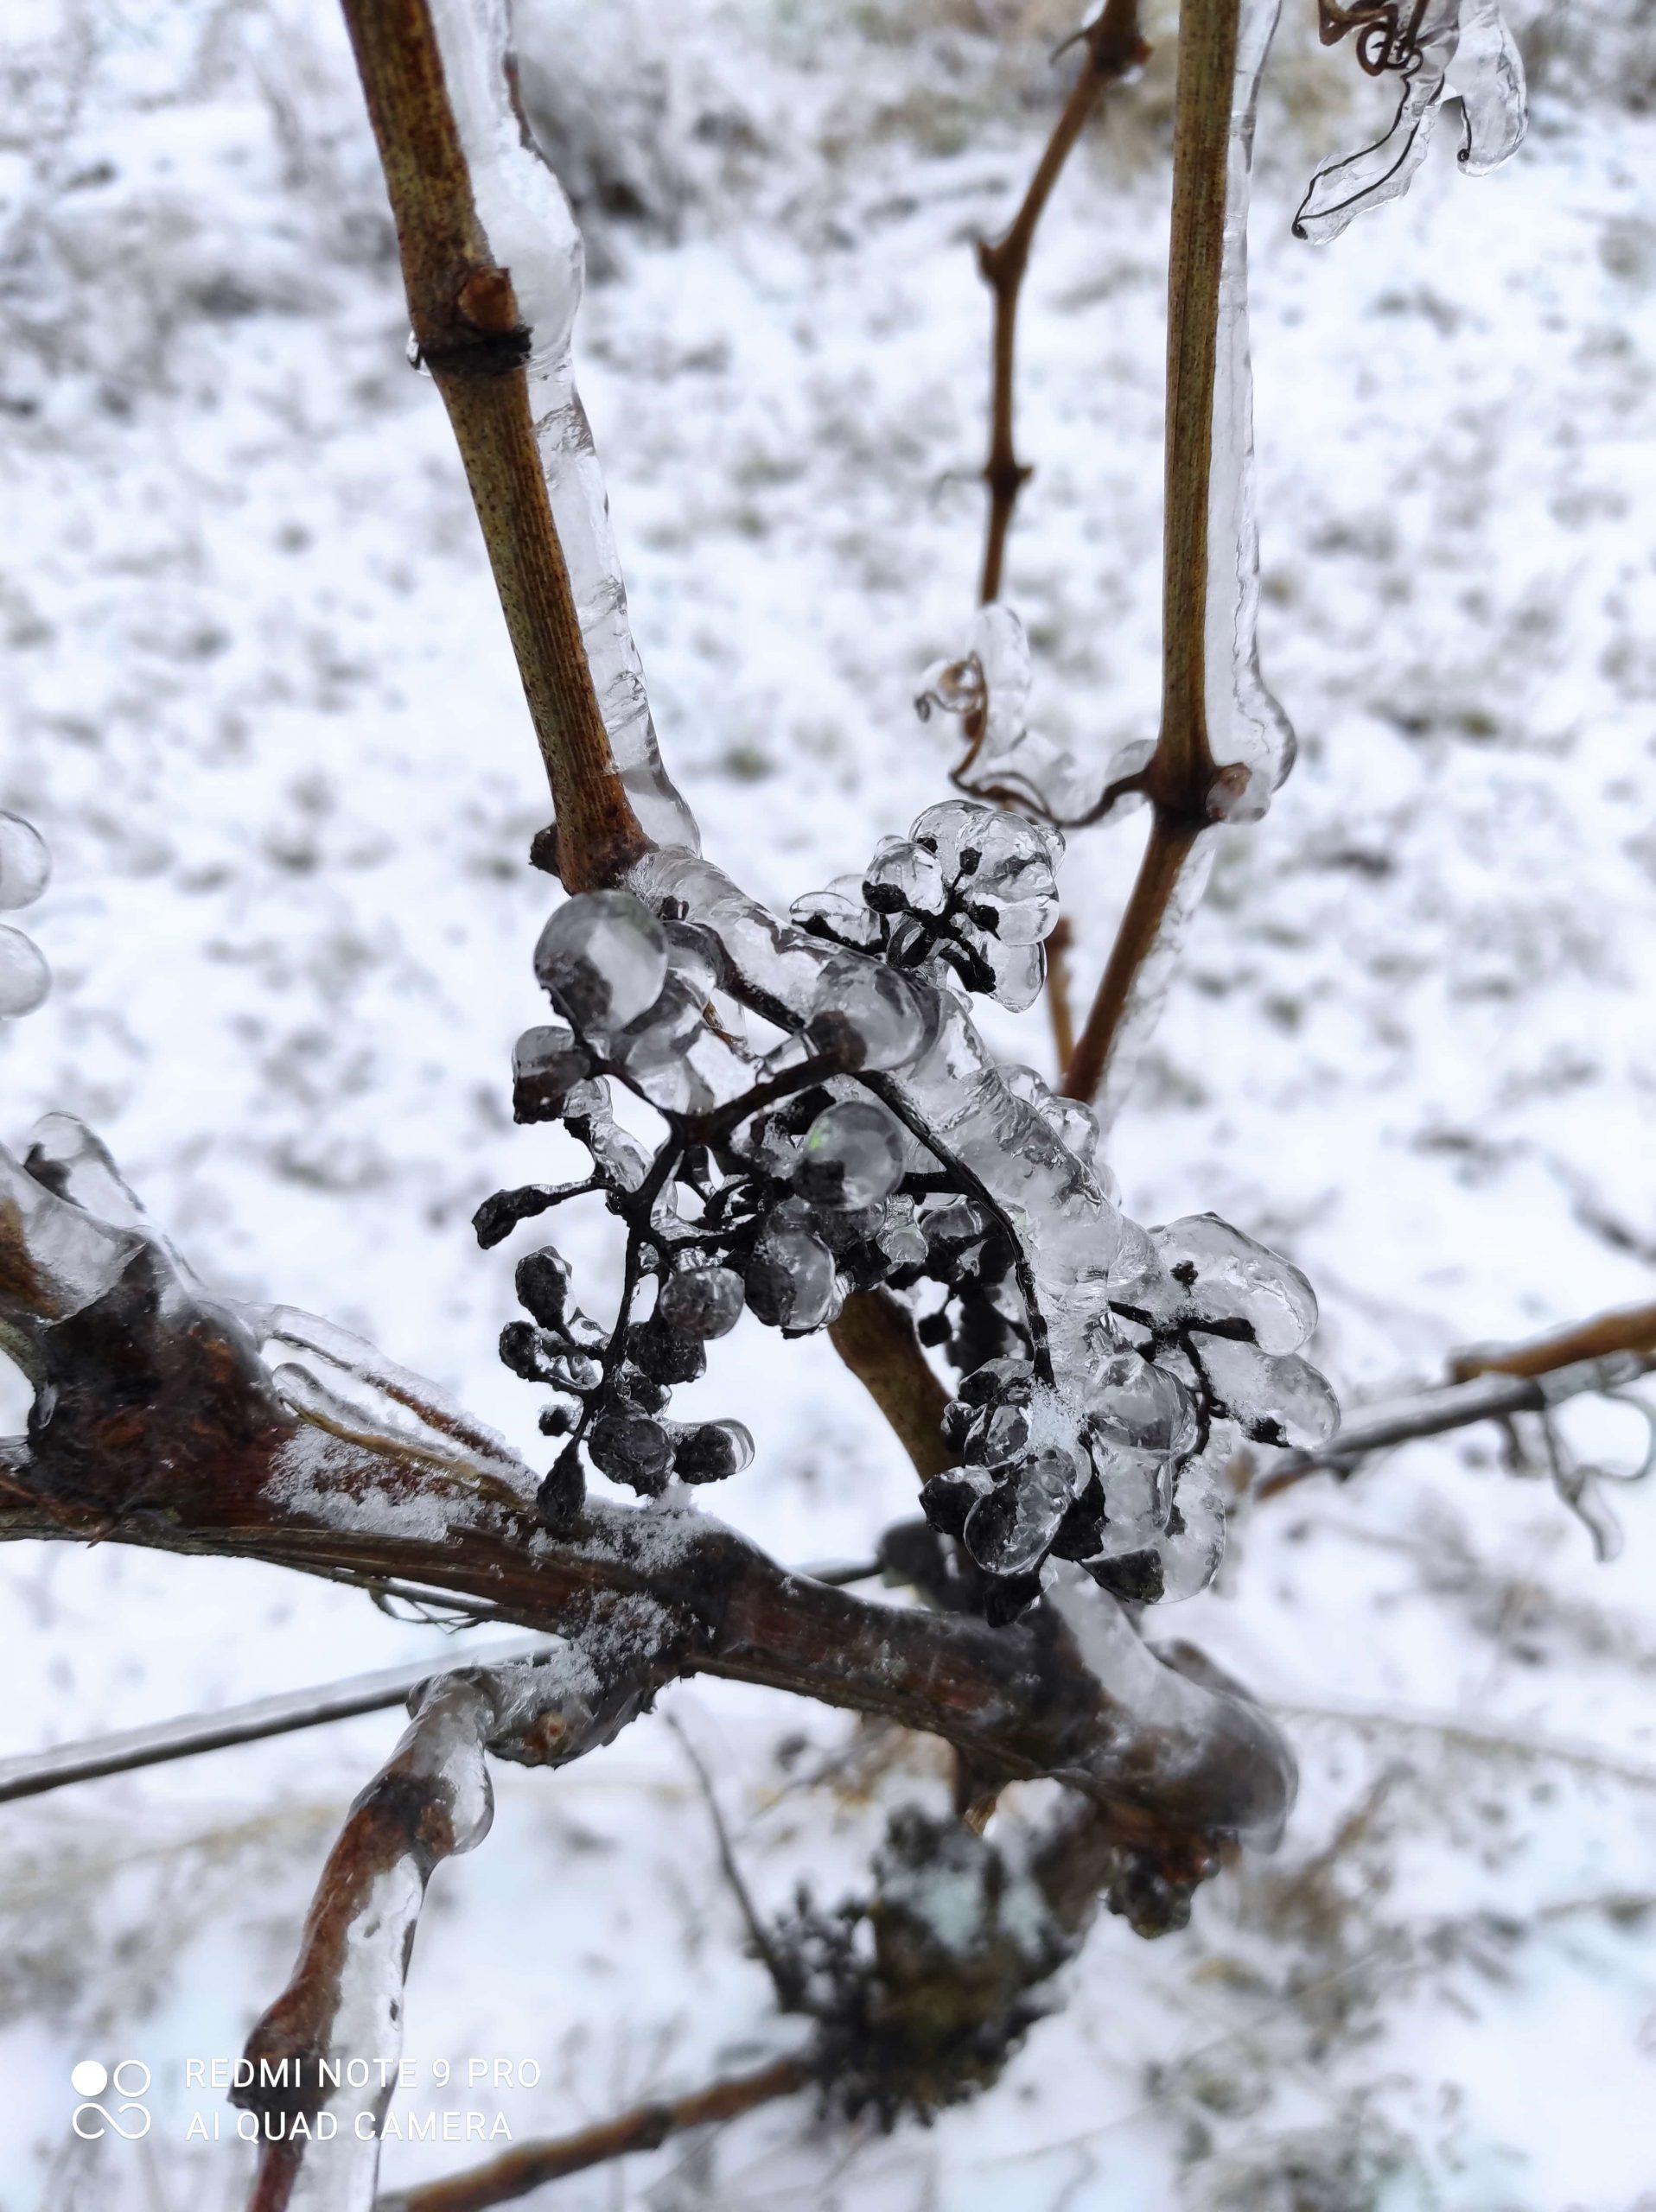 vinohrad10_Vinarstvo Kopecek-min